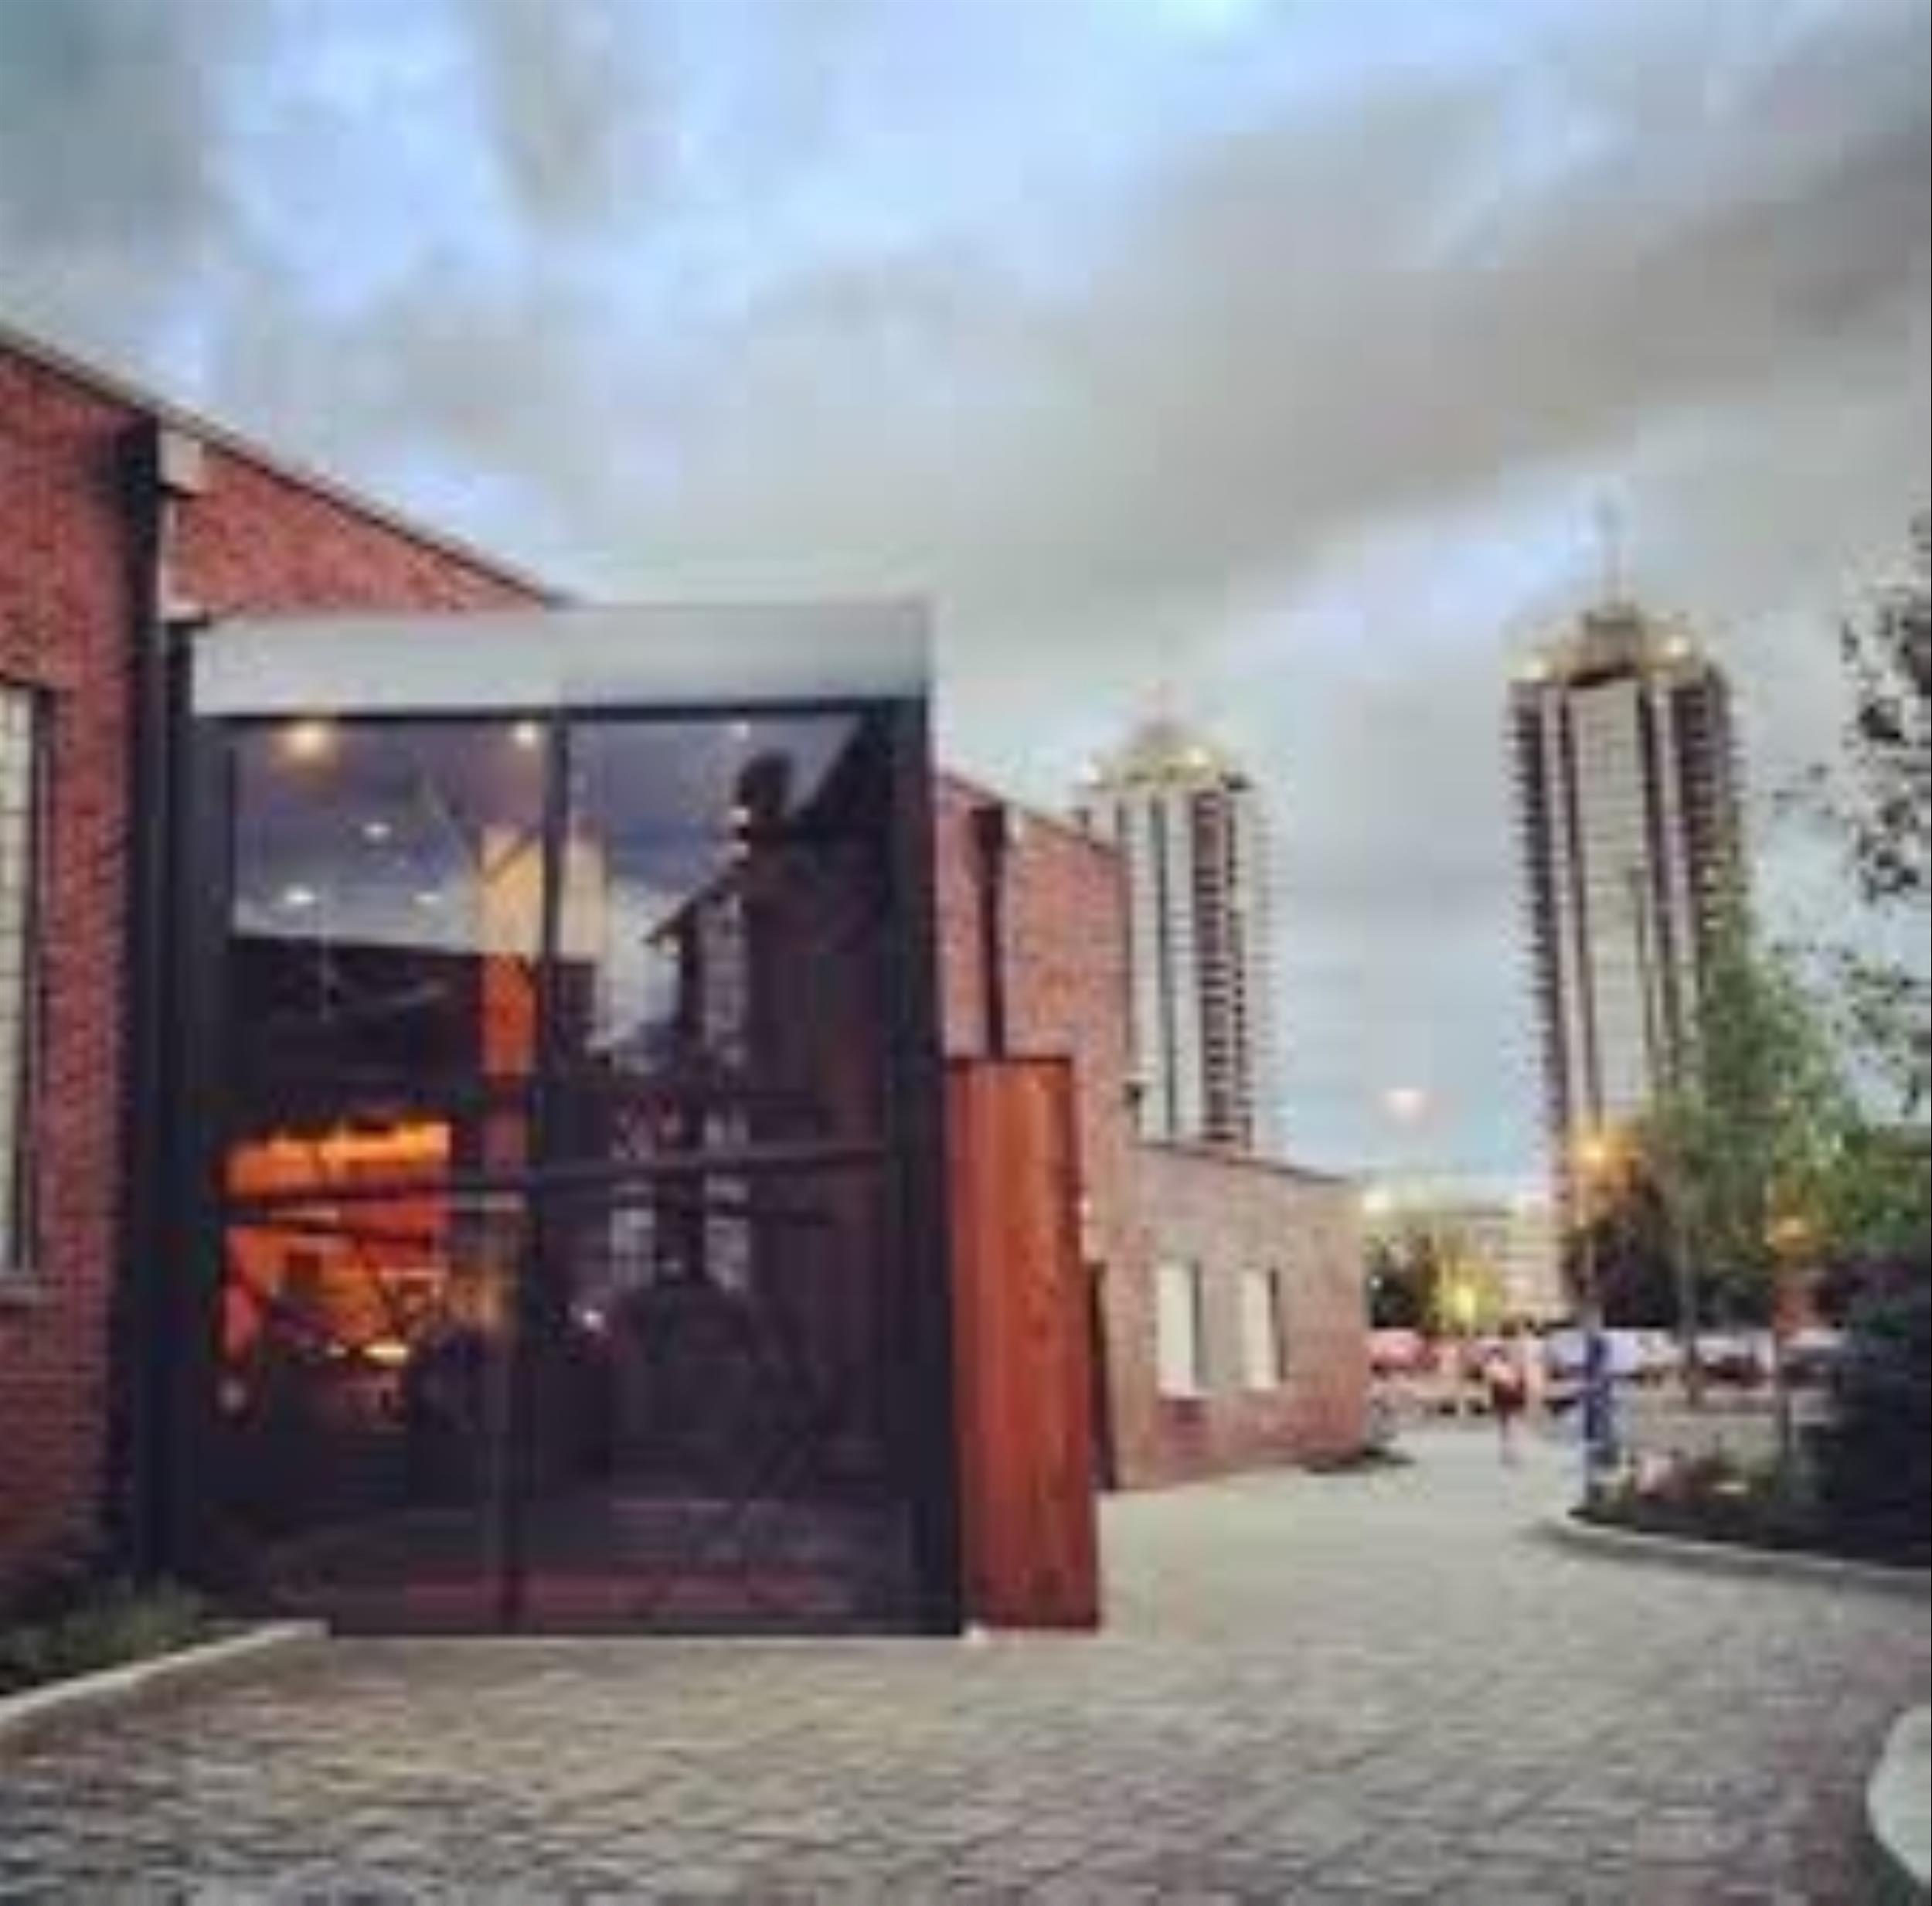 Union 50 Restaurant and Bar